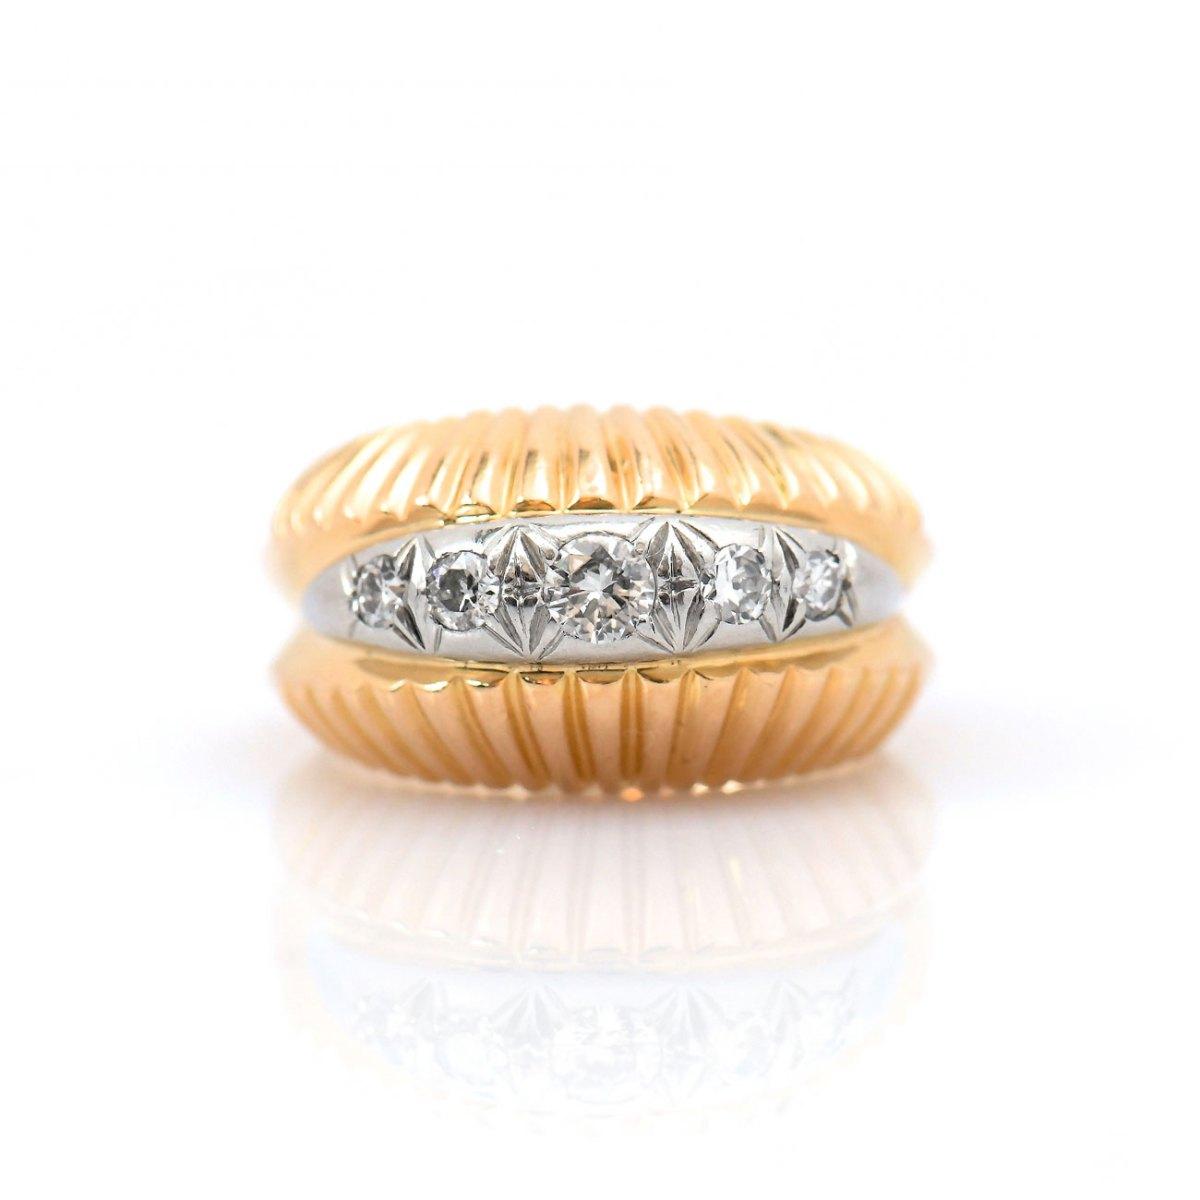 Bague diamants coquillage or jaune et platine, 5 diamants taille brillant serti griffes, or jaune et platine, taille 56/57 | Réf. BA-B18334 | EVENOR Joaillerie